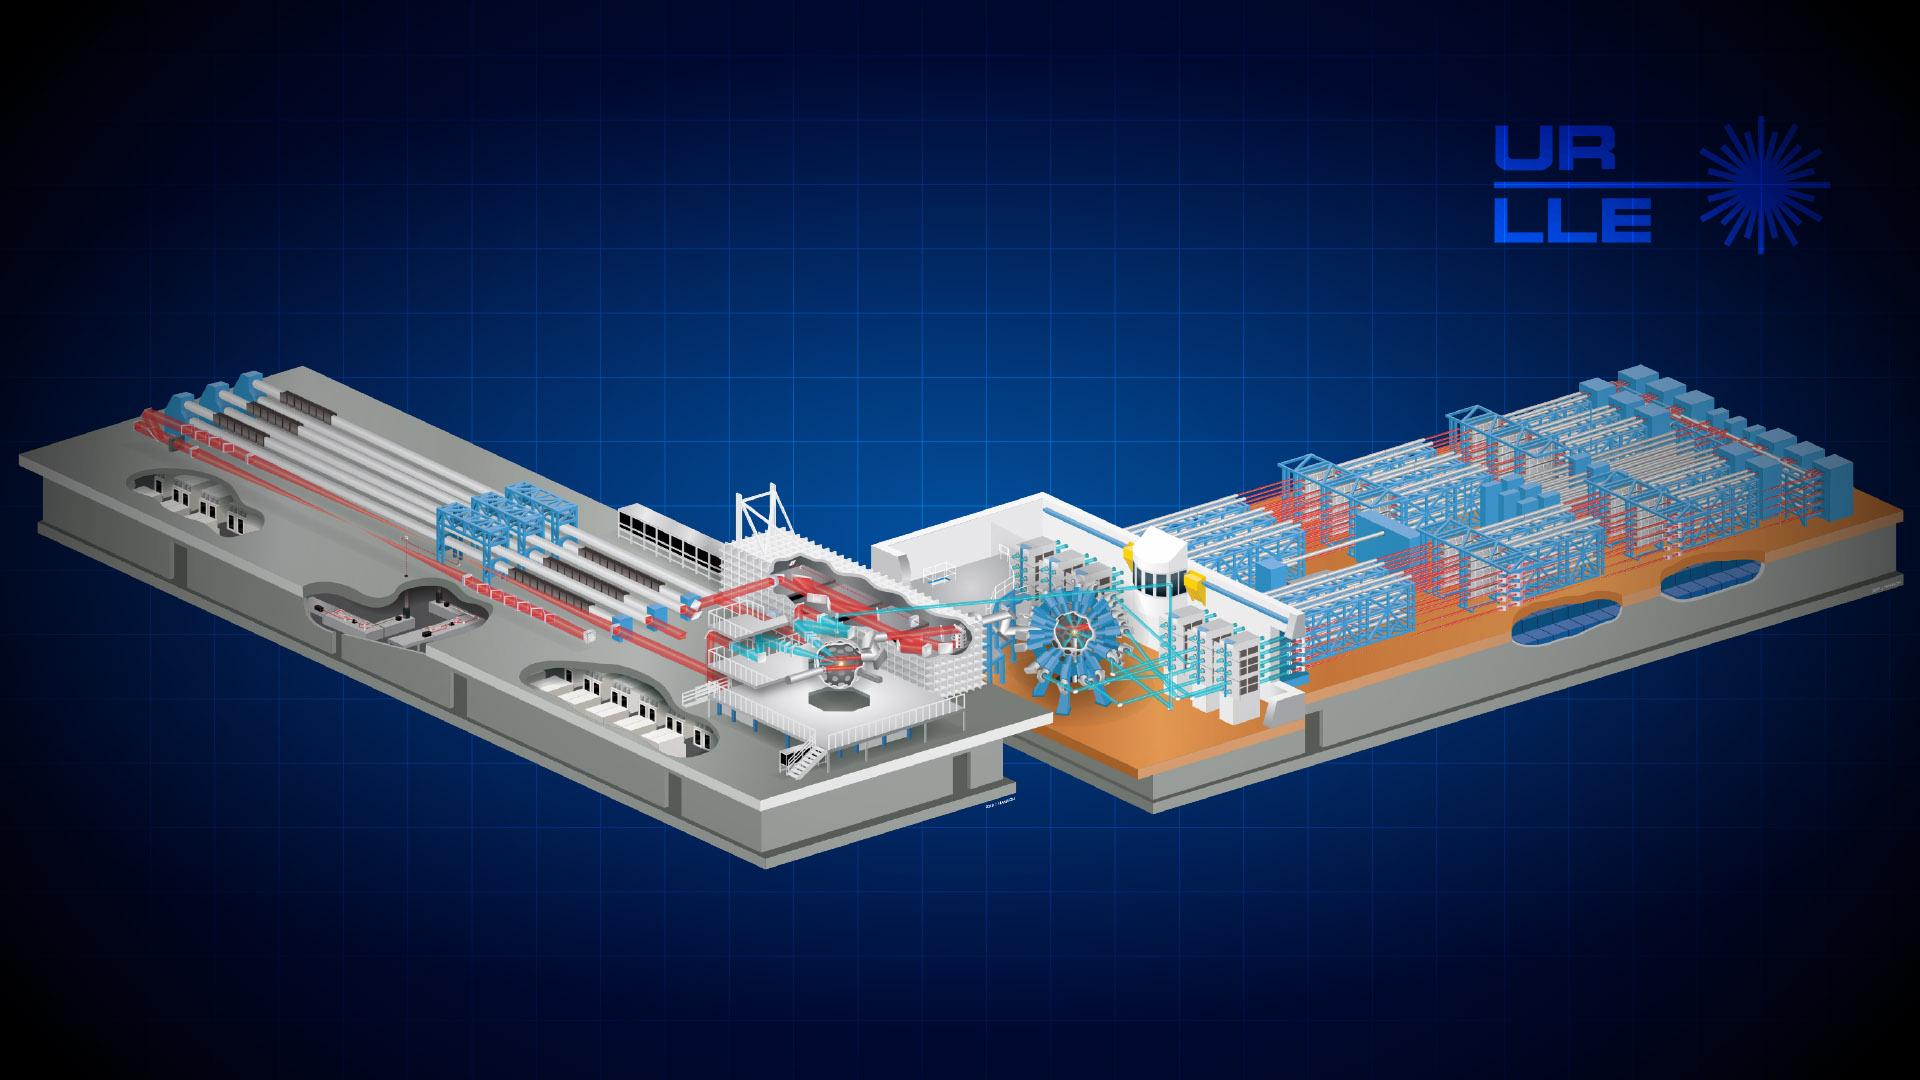 Zoom background with illustration of Omega Laser Facility